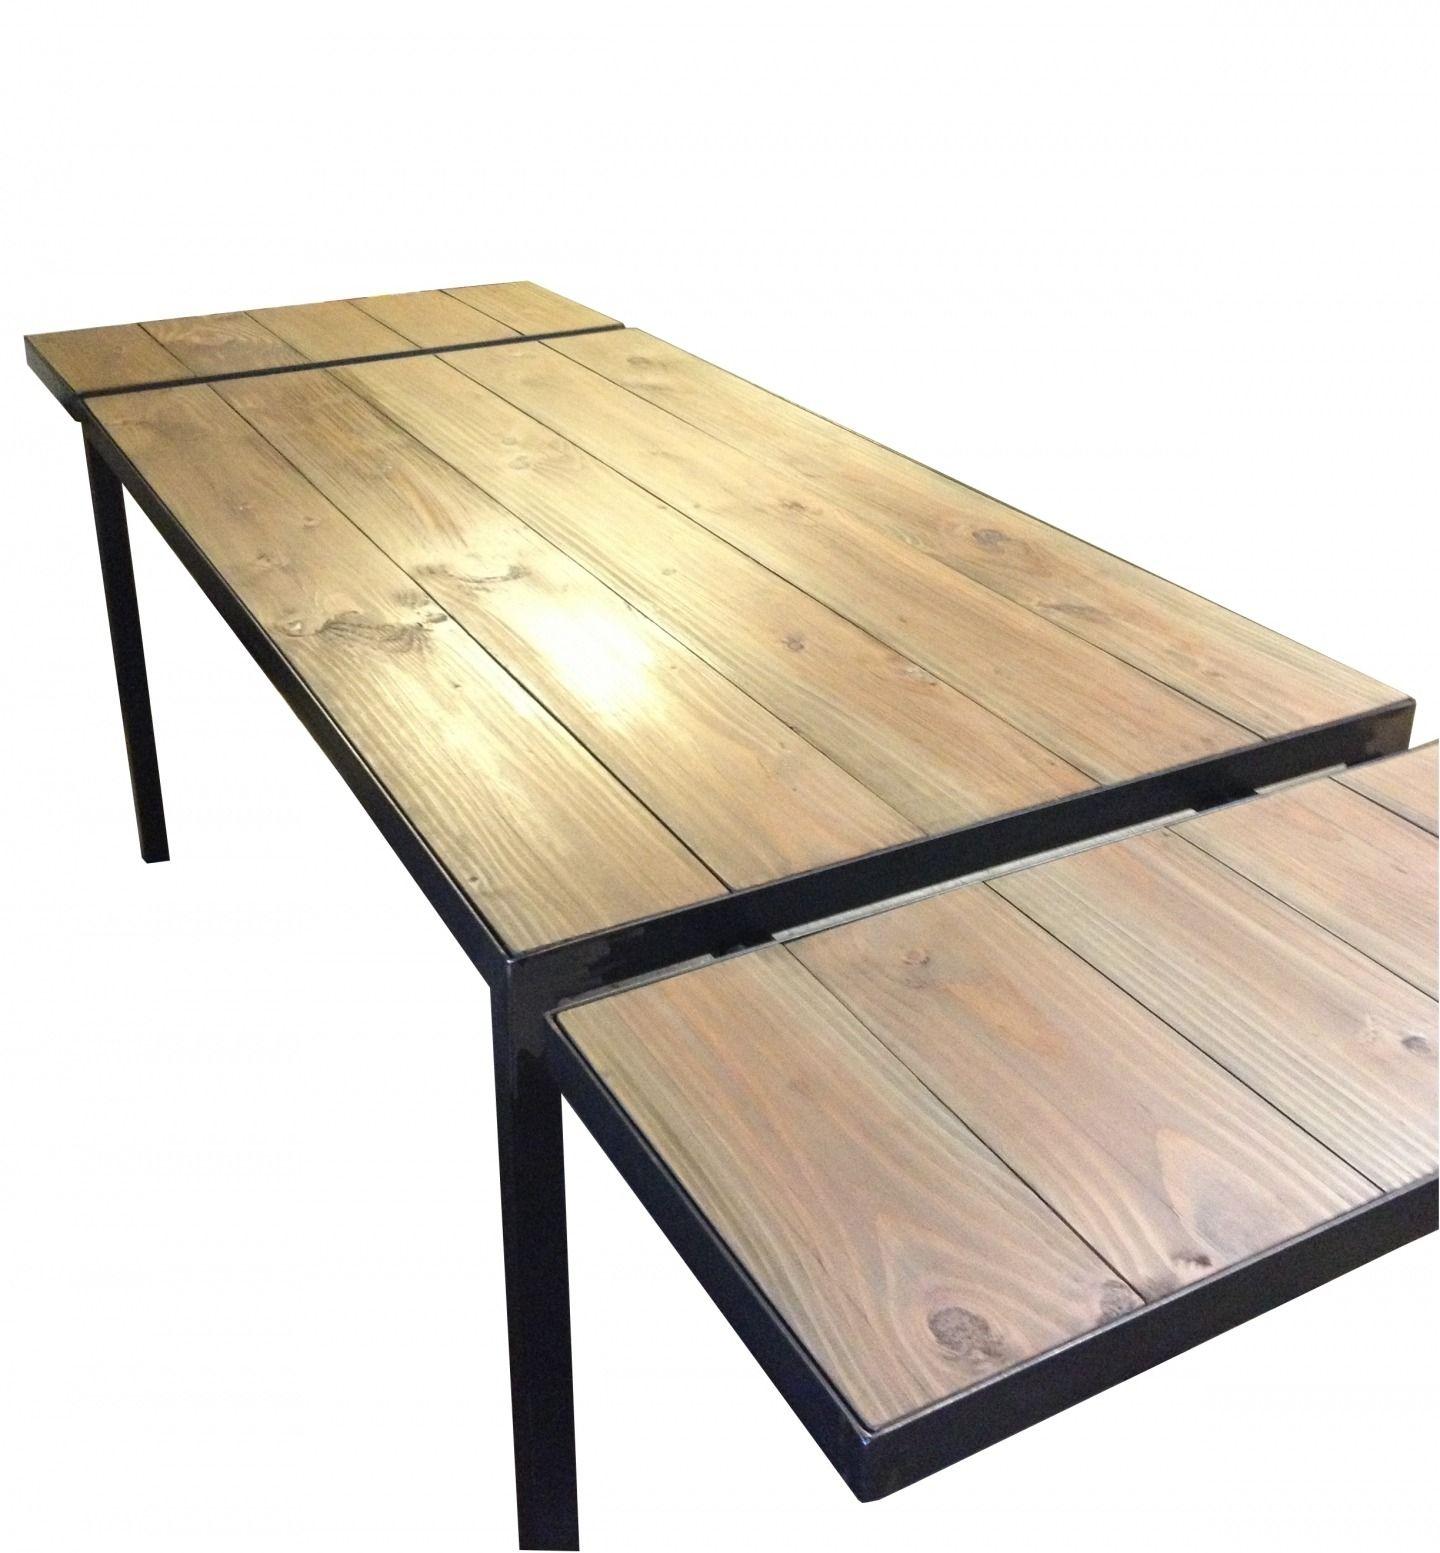 337da35fd7a997e87bb1cfd3f29d7b51 Incroyable De Table Basse Anglais Conception